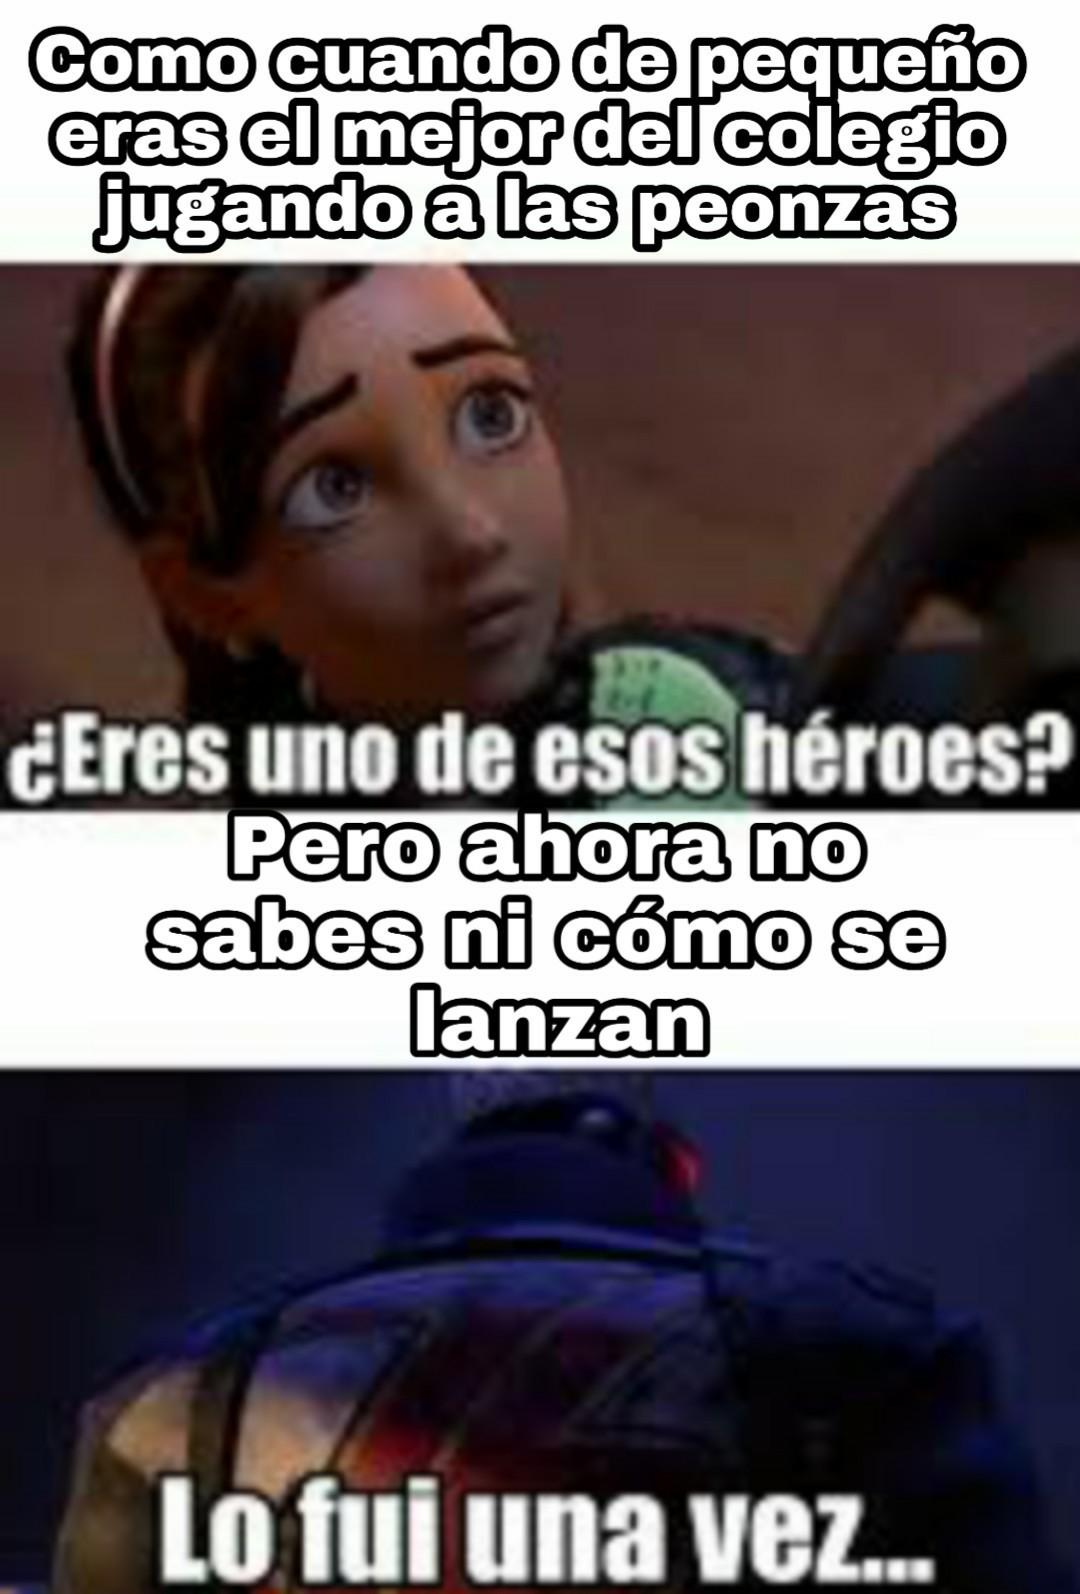 Fuiste uno de esos heroes jajaja - meme